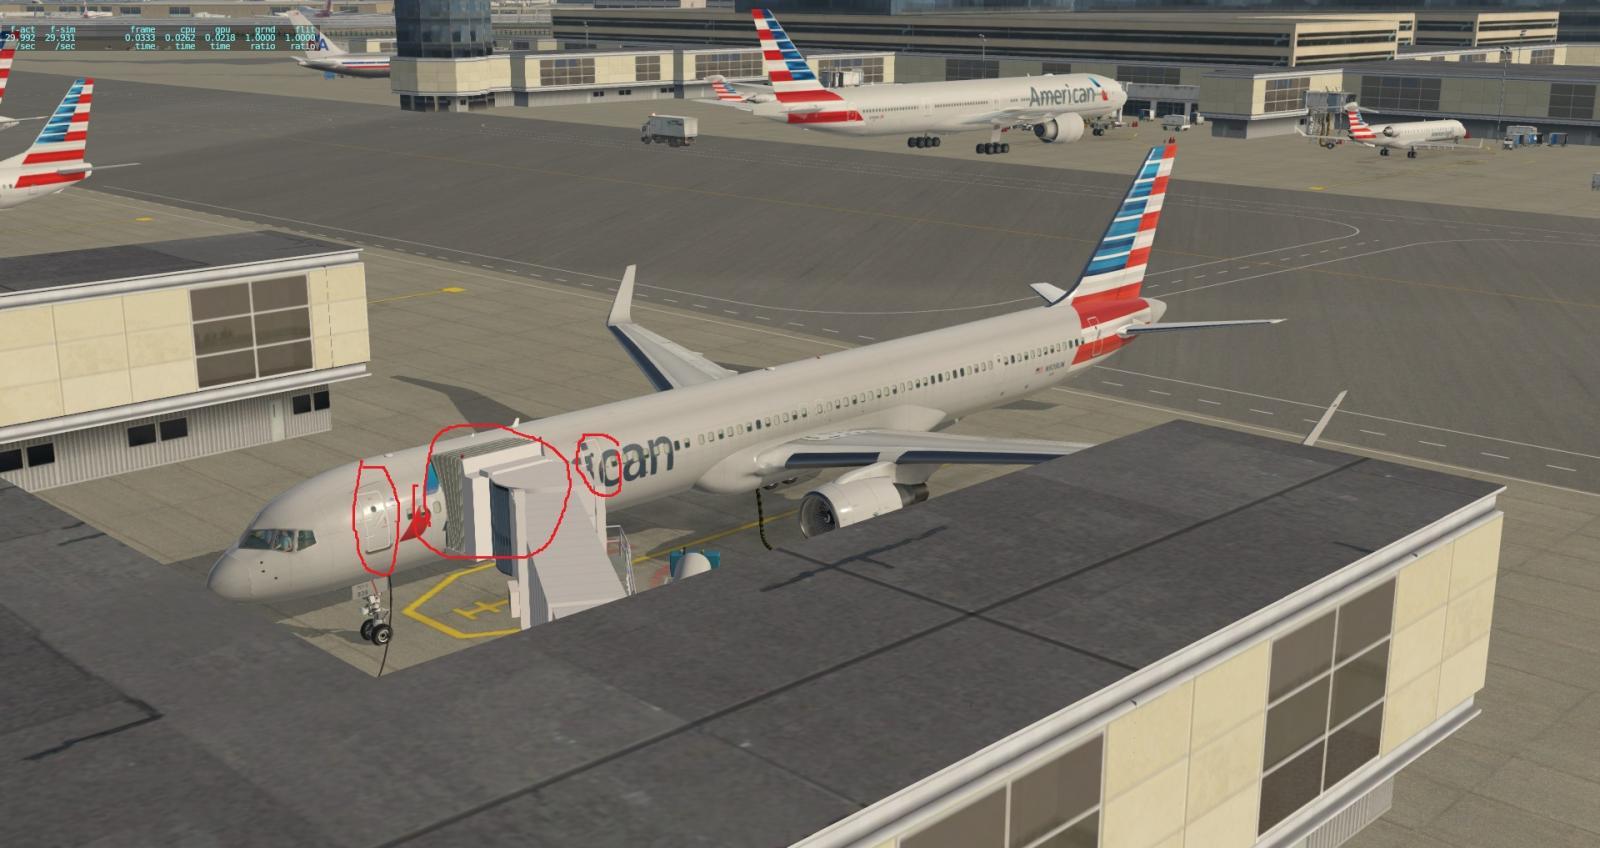 ANSWERED] Autogate / moving jetways do not align properly